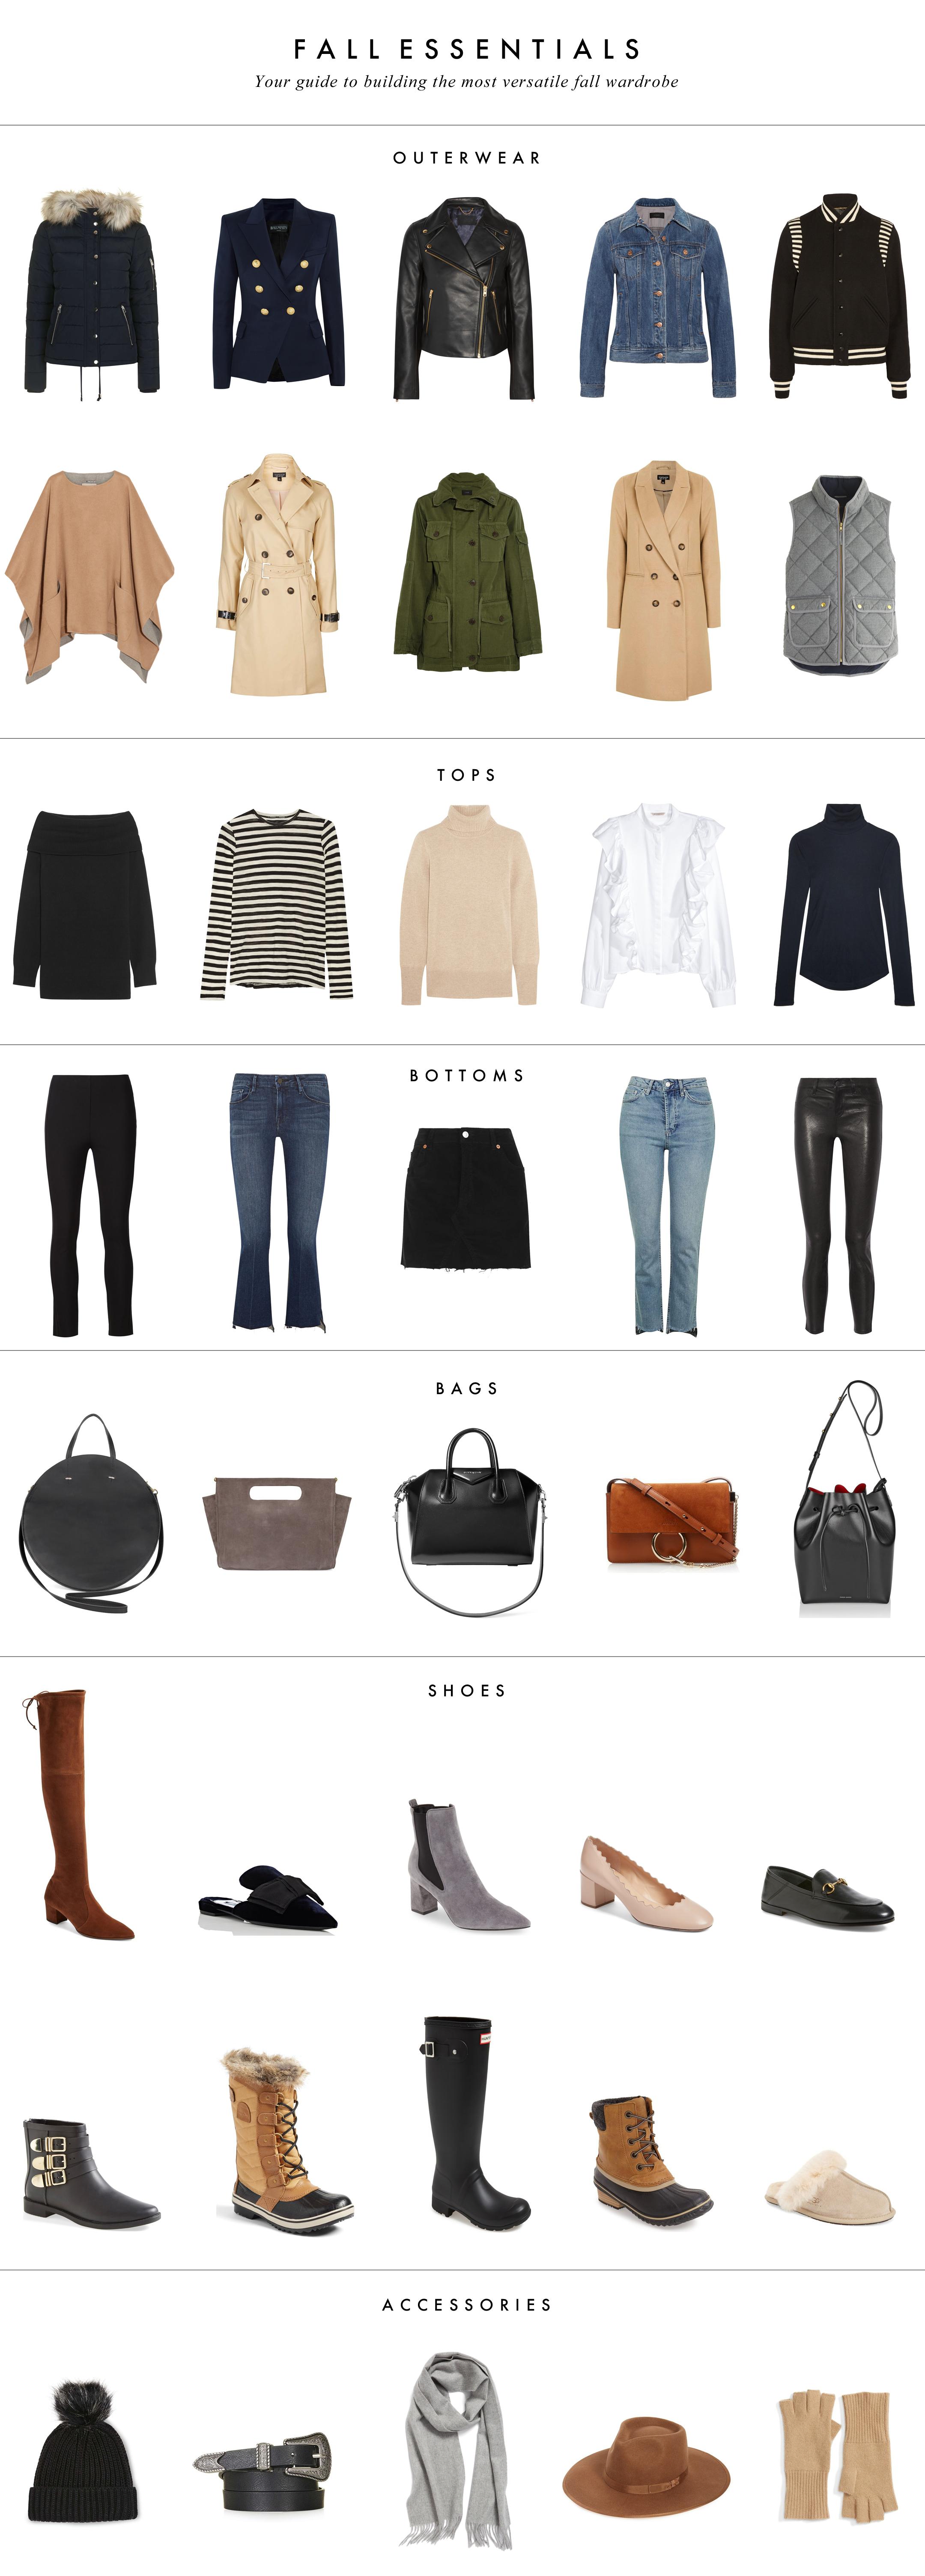 2016-fall-essentials